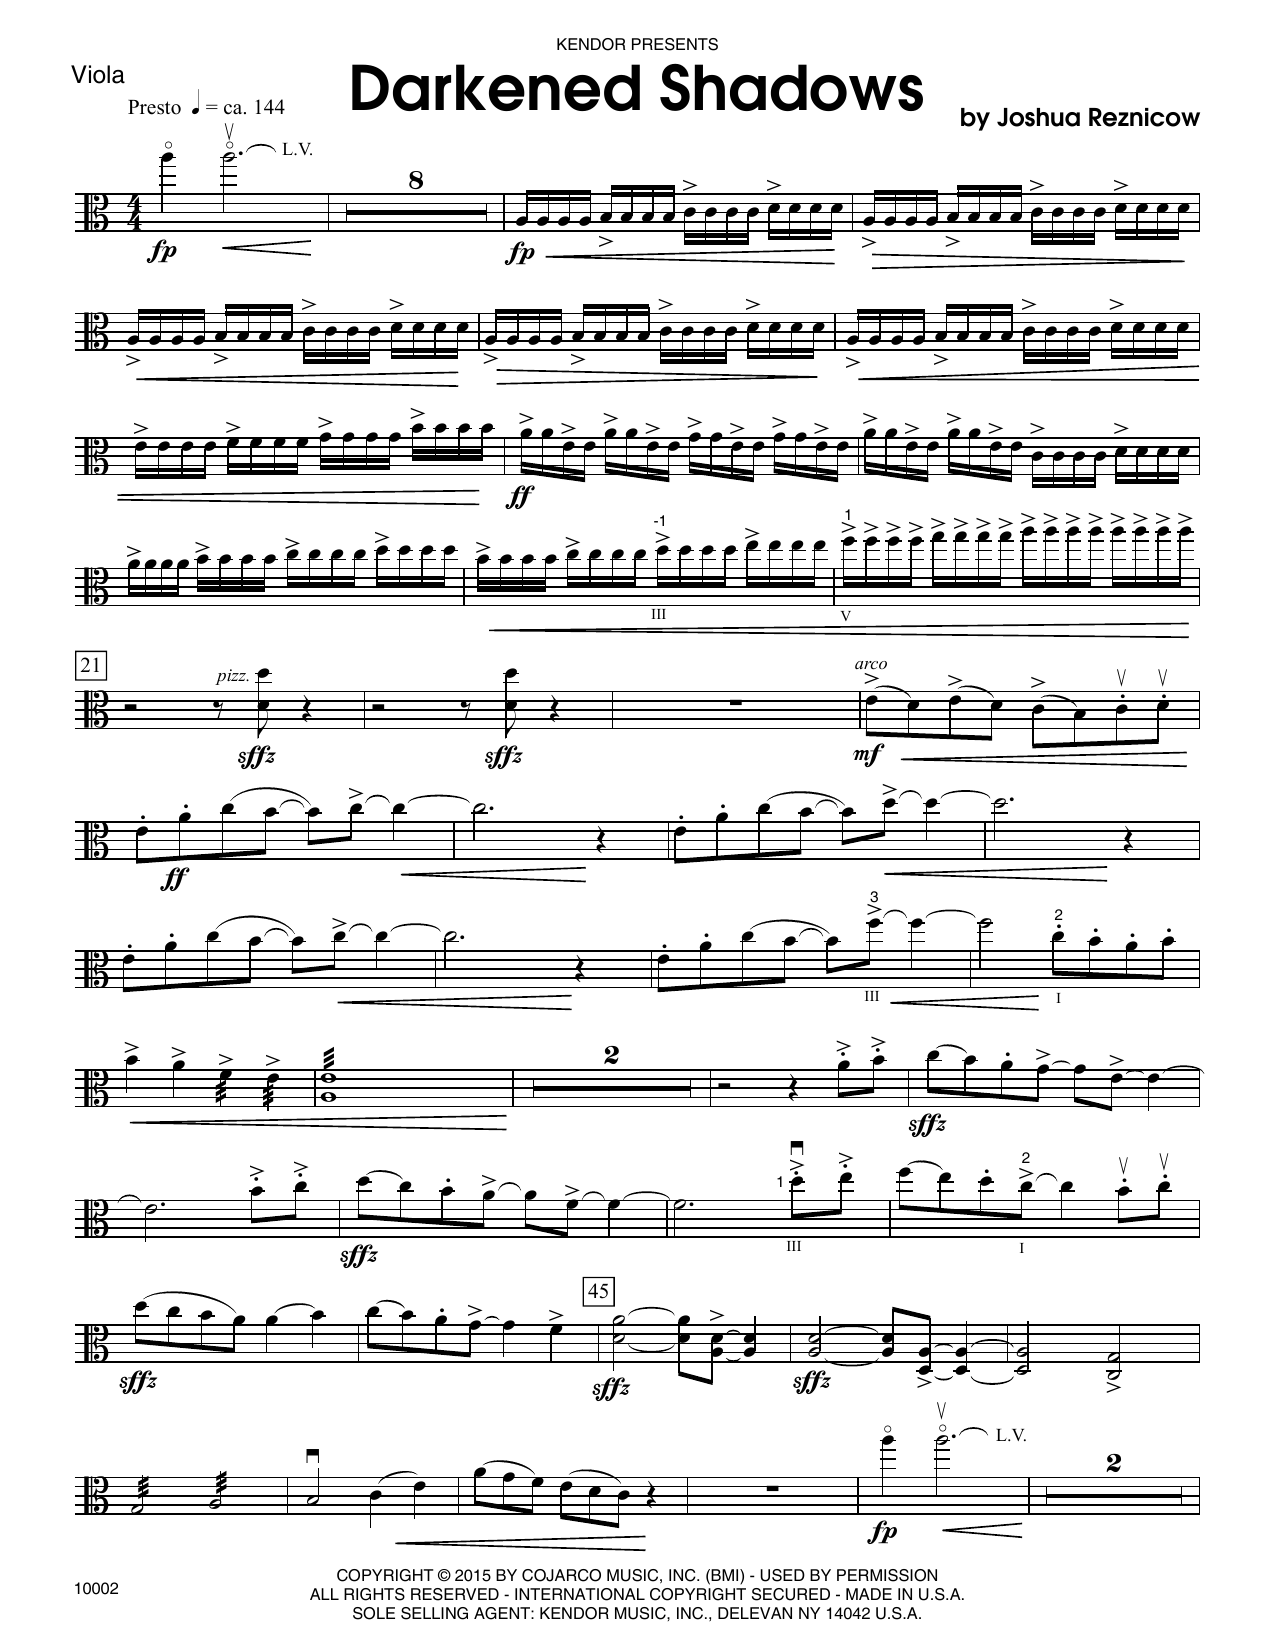 Joshue Reznicow Darkened Shadows - Viola sheet music notes and chords. Download Printable PDF.